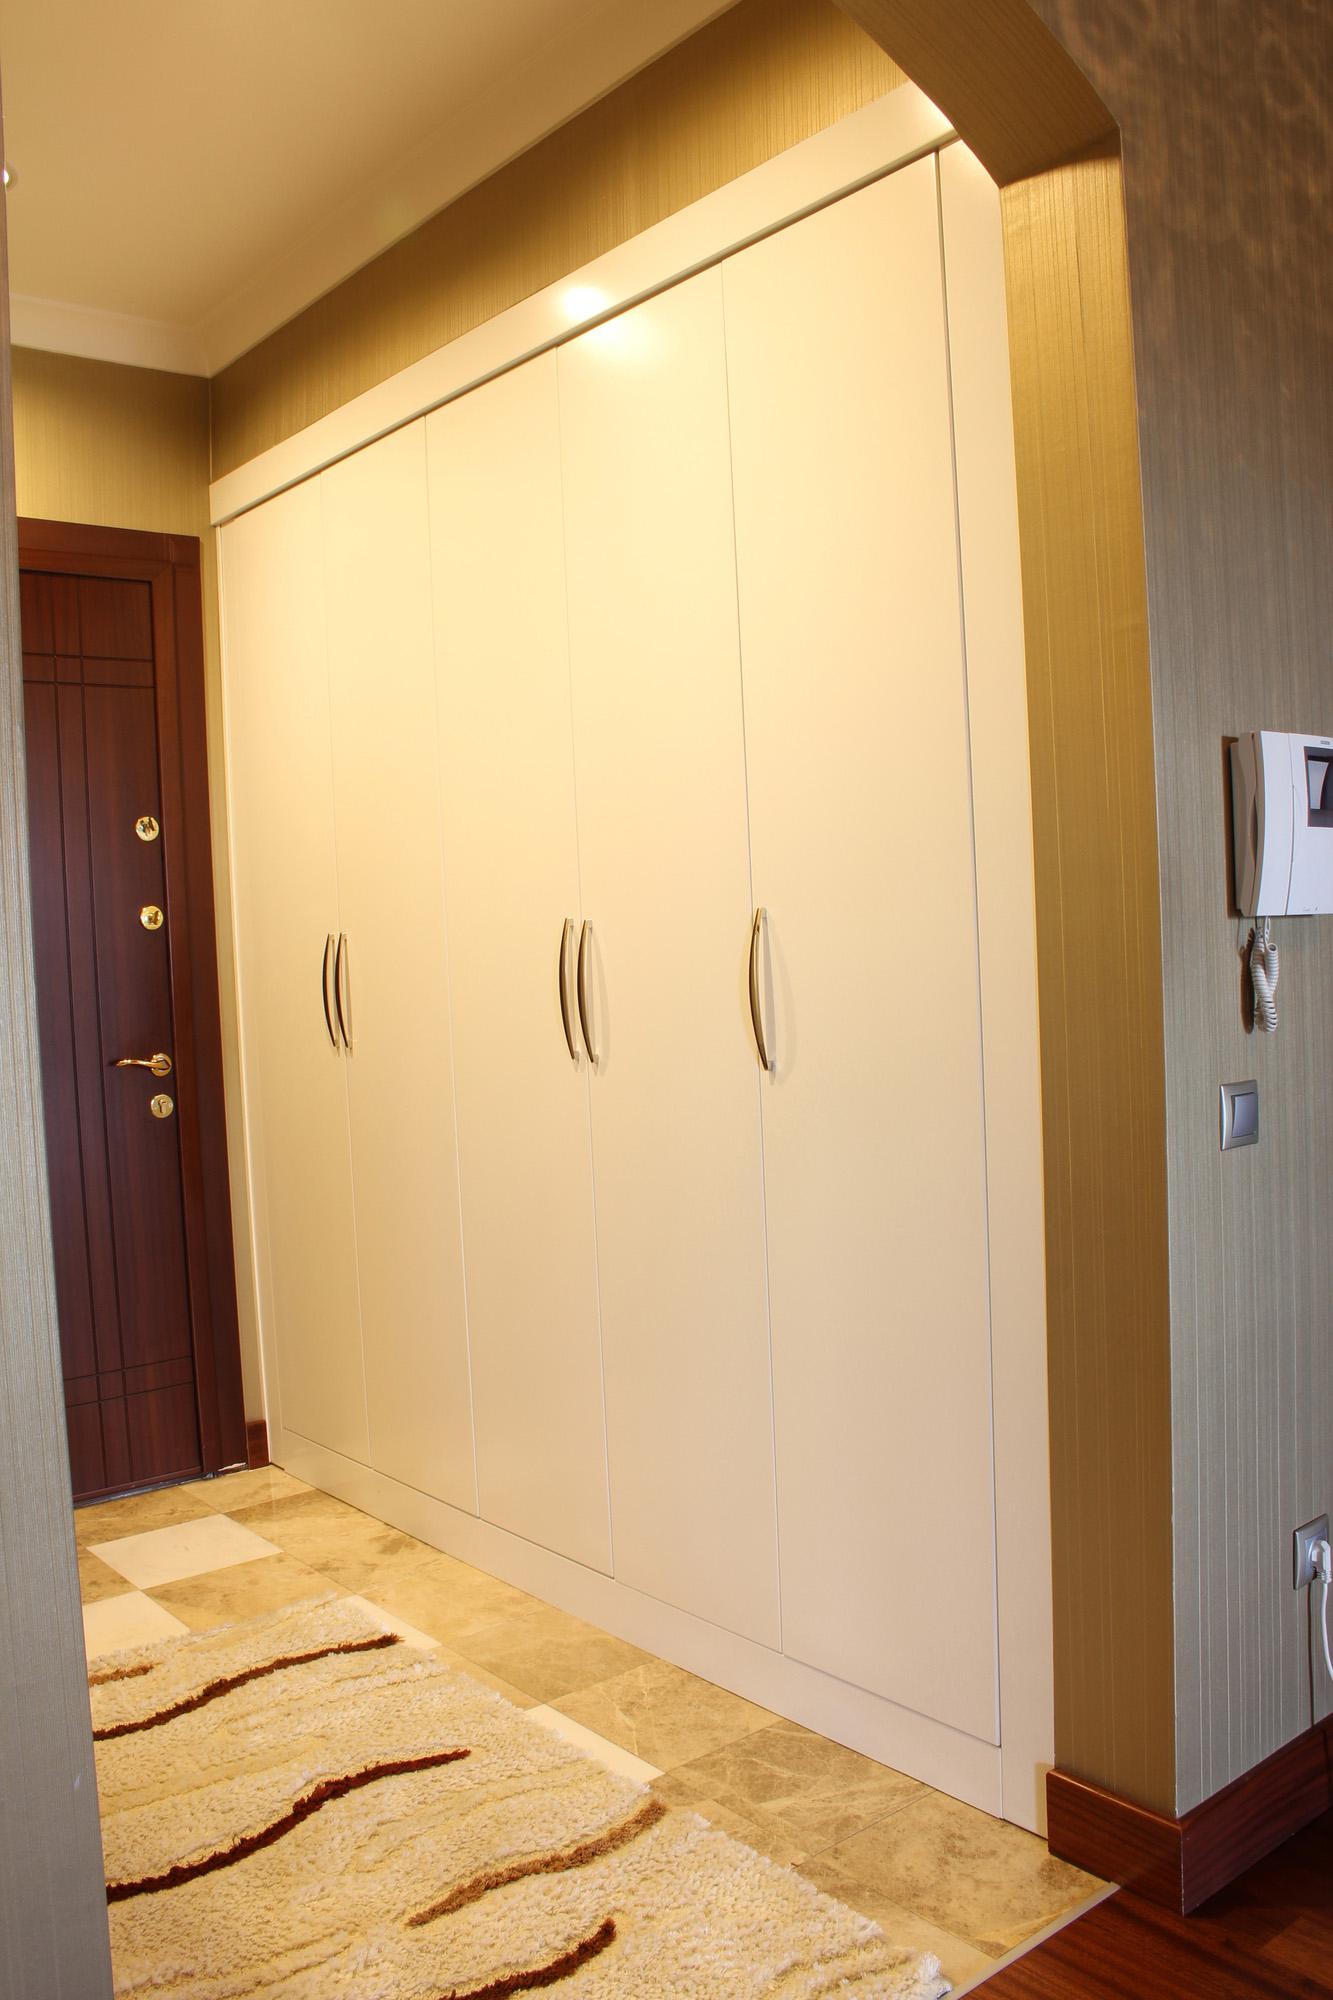 Fitted wardrobe interiors, wardrobe lights, wardrobe internal drawers